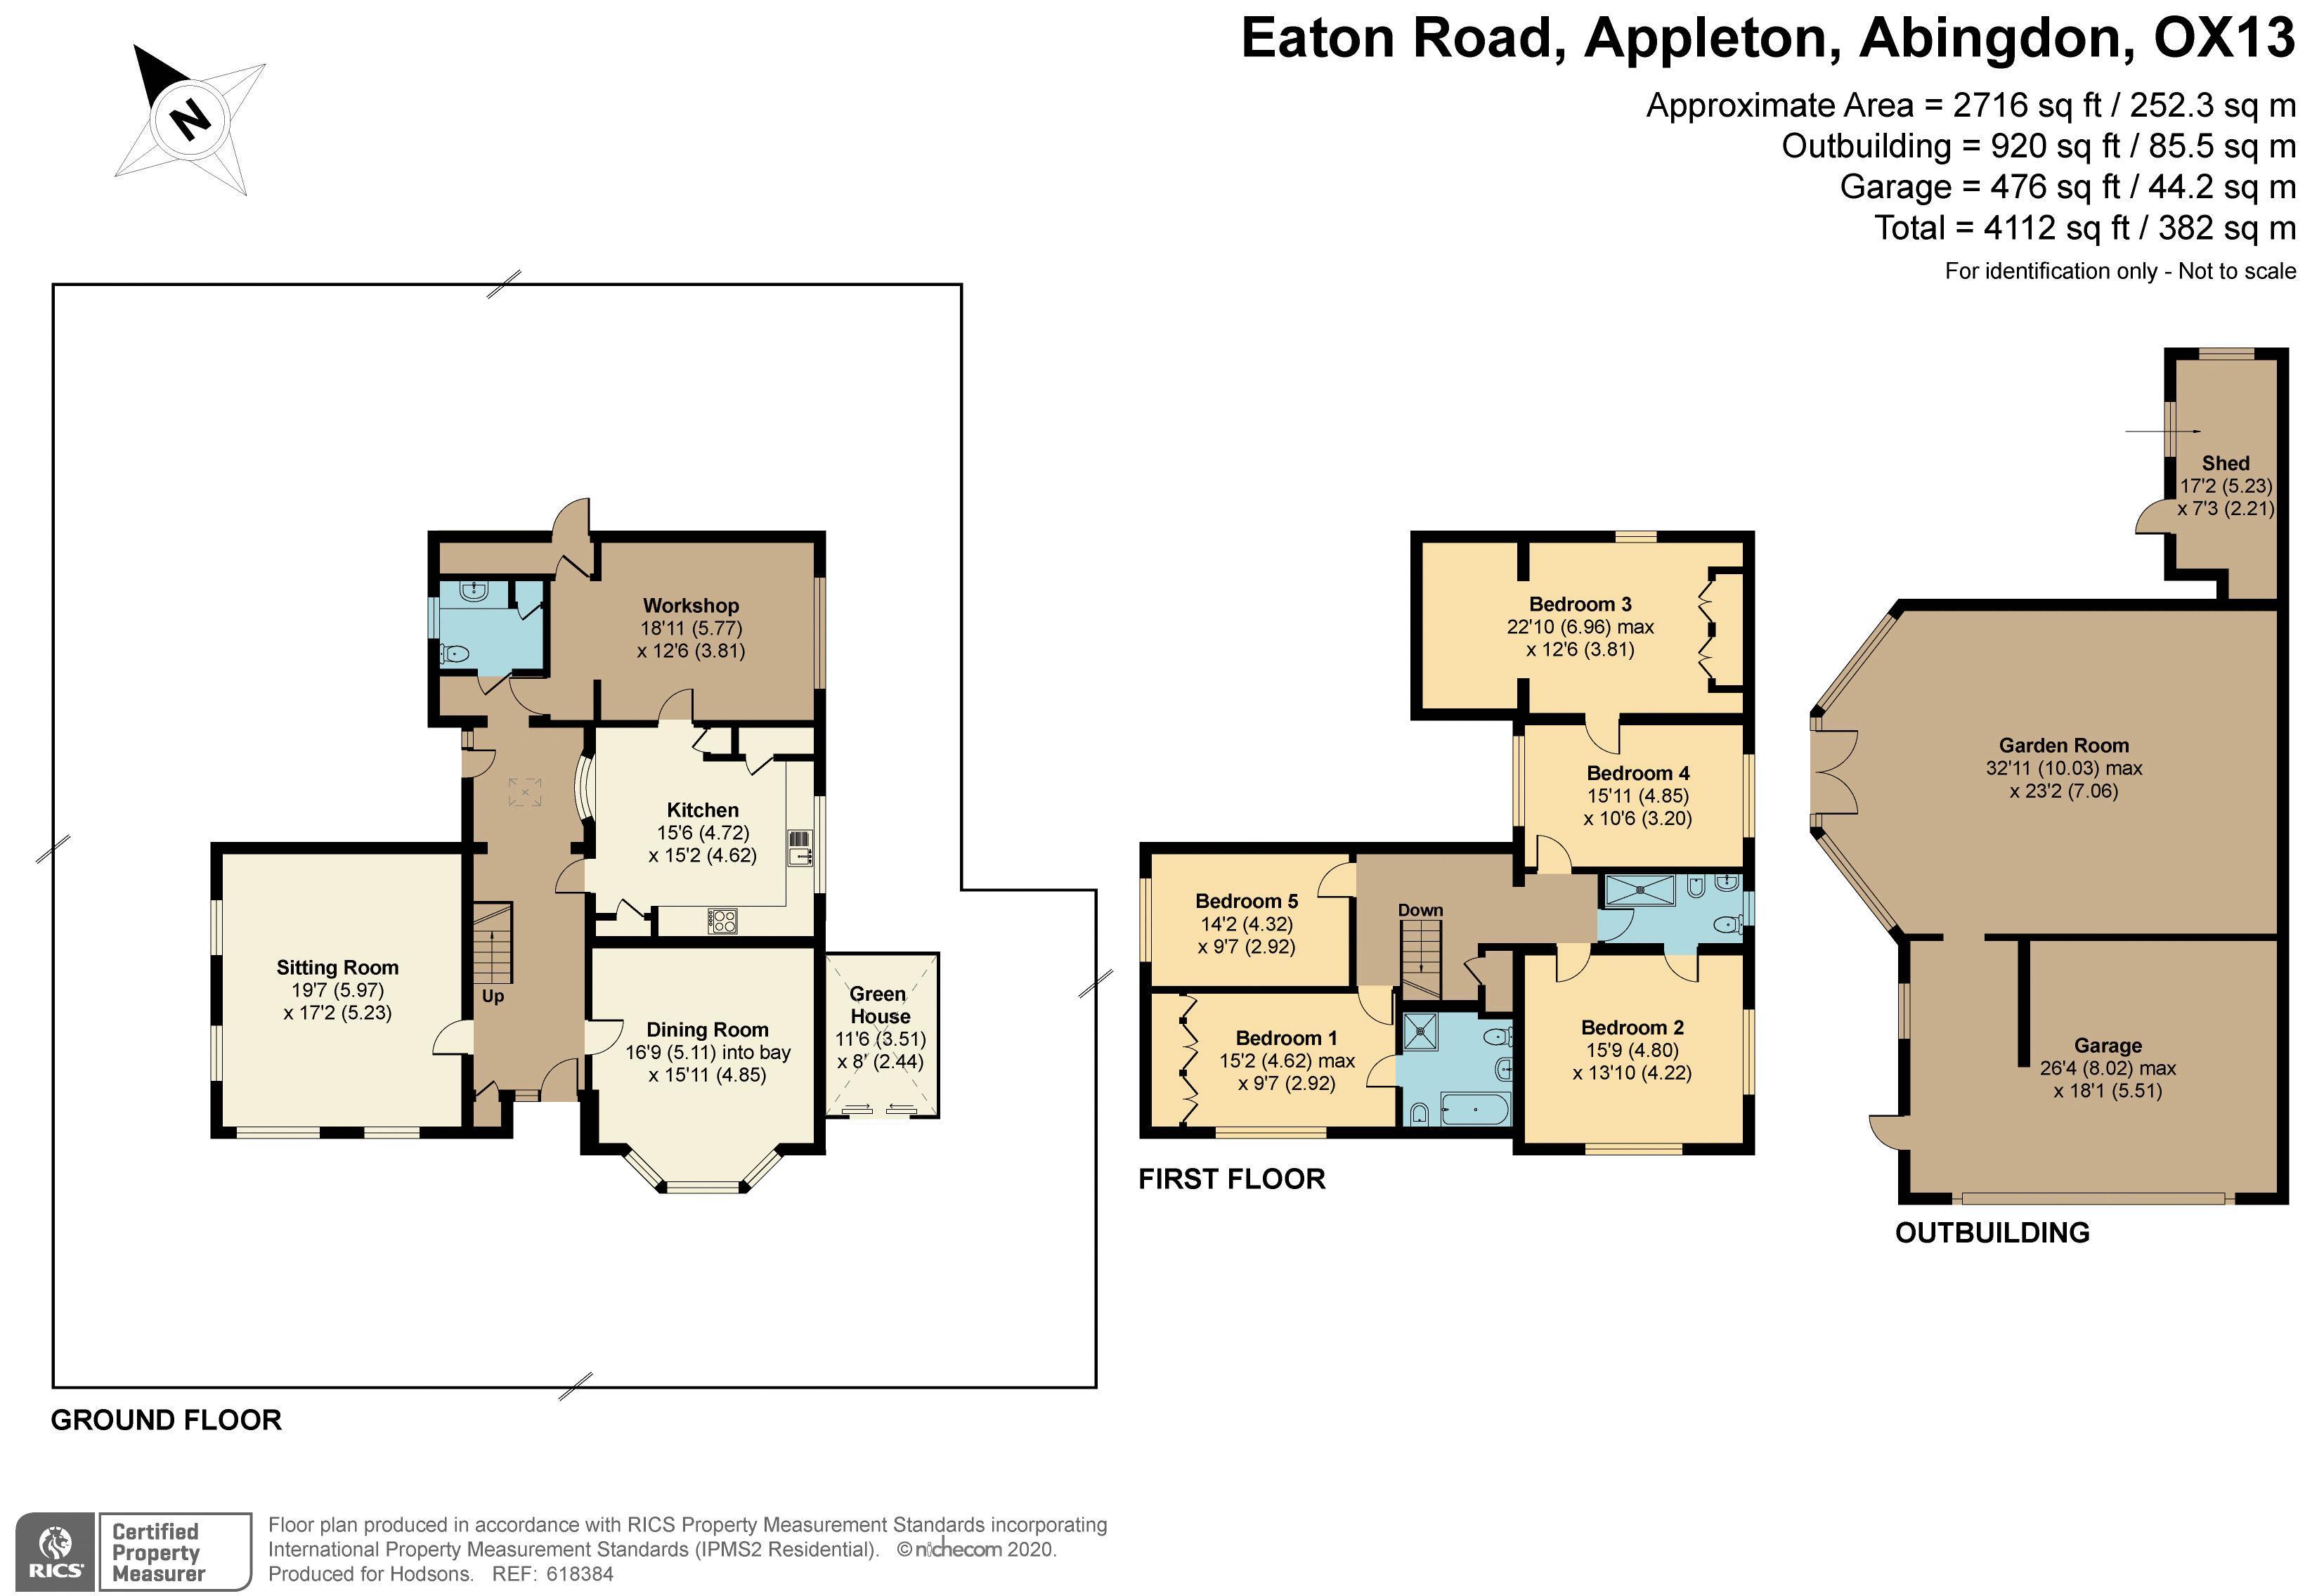 28 Eaton Road Appleton